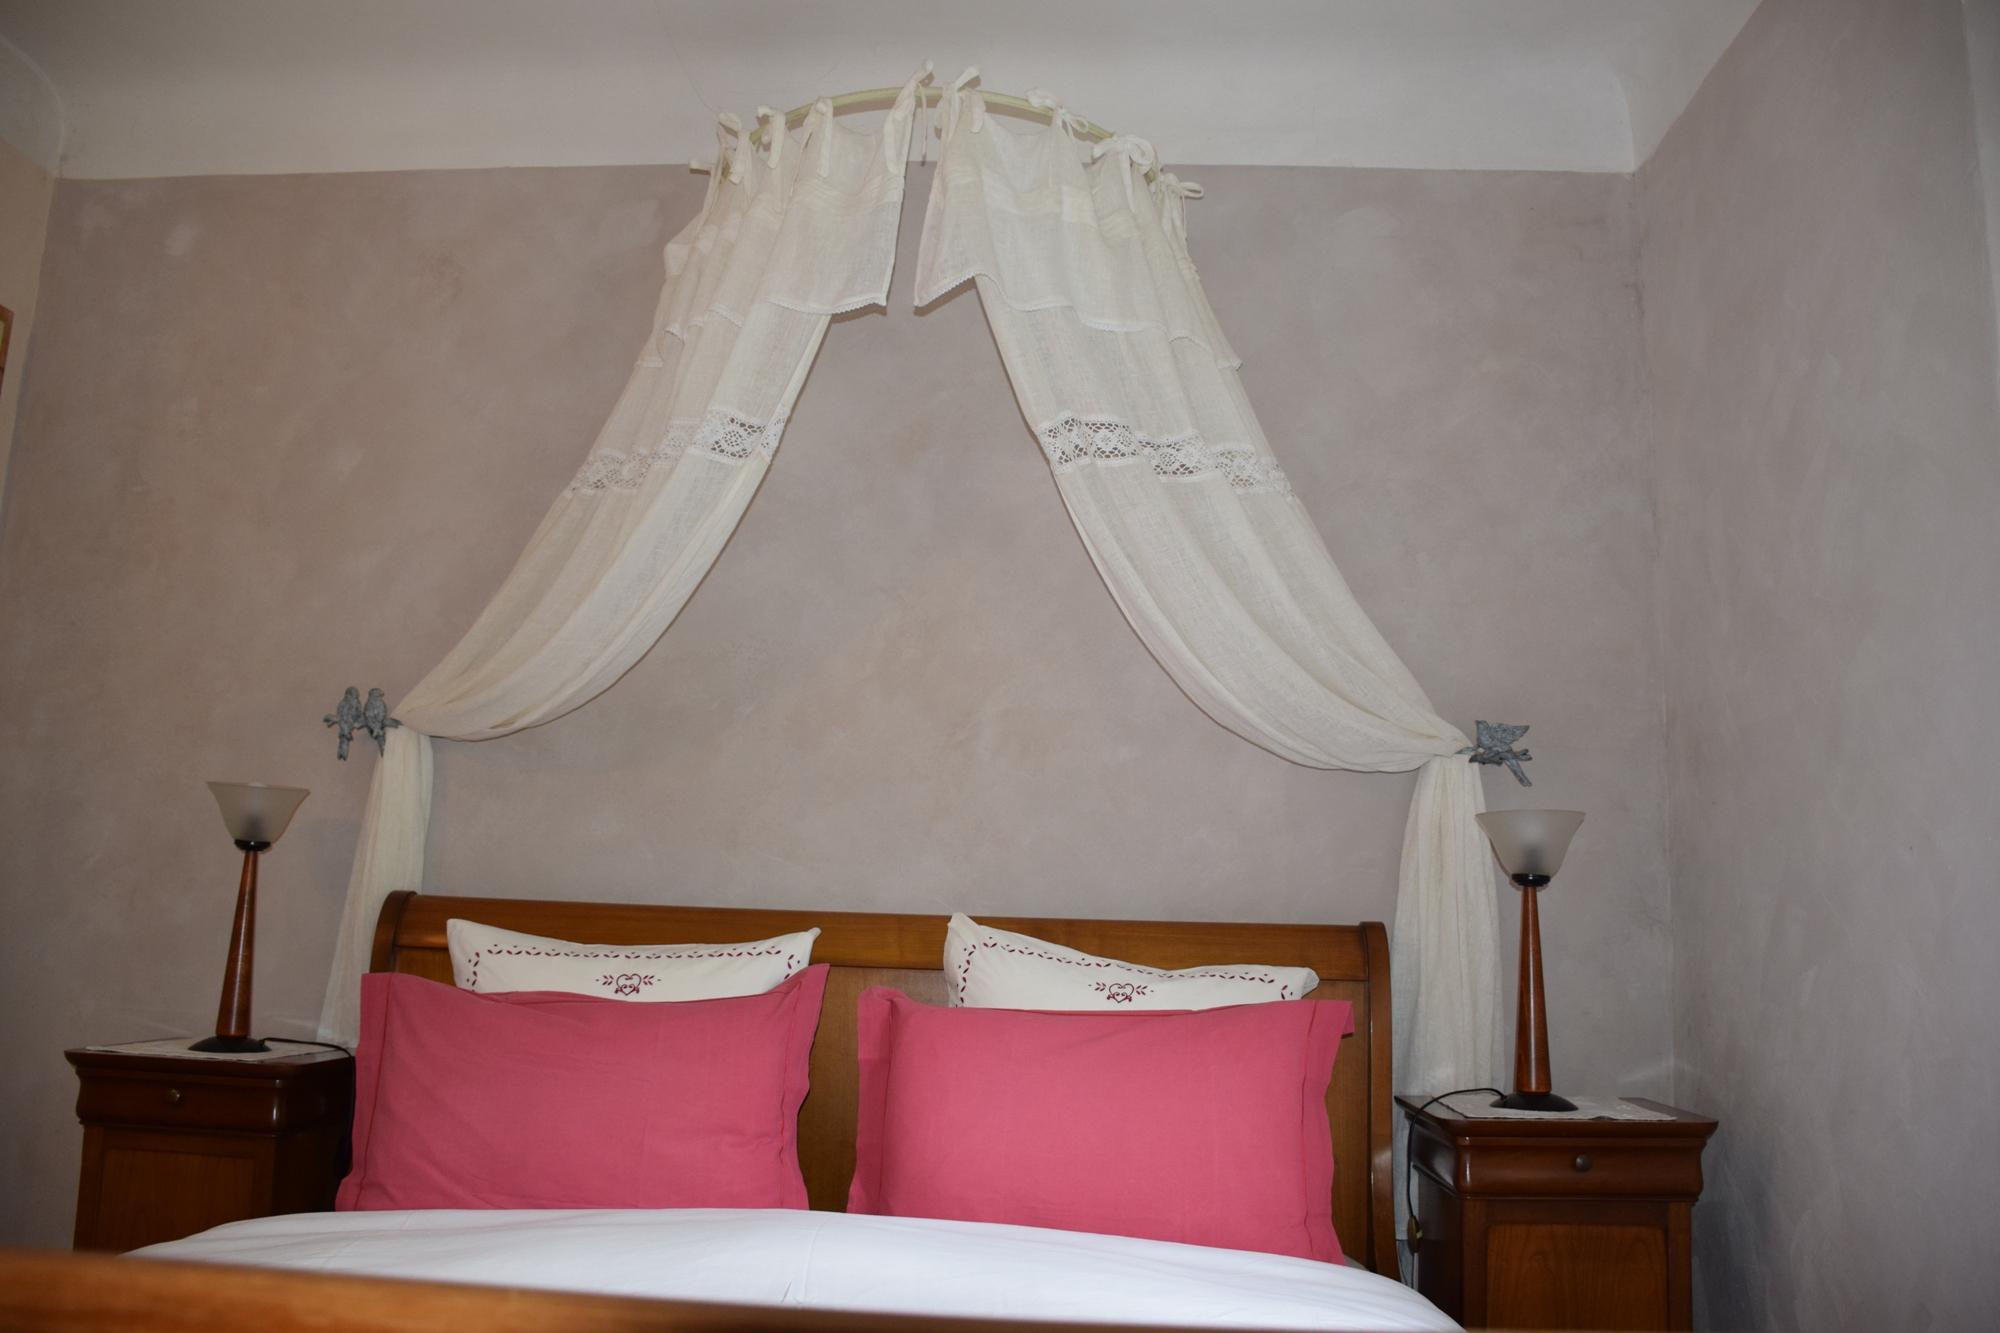 Chambres d 39 h tes la villa du lac chambre roseli re for Recherche chambre d hote